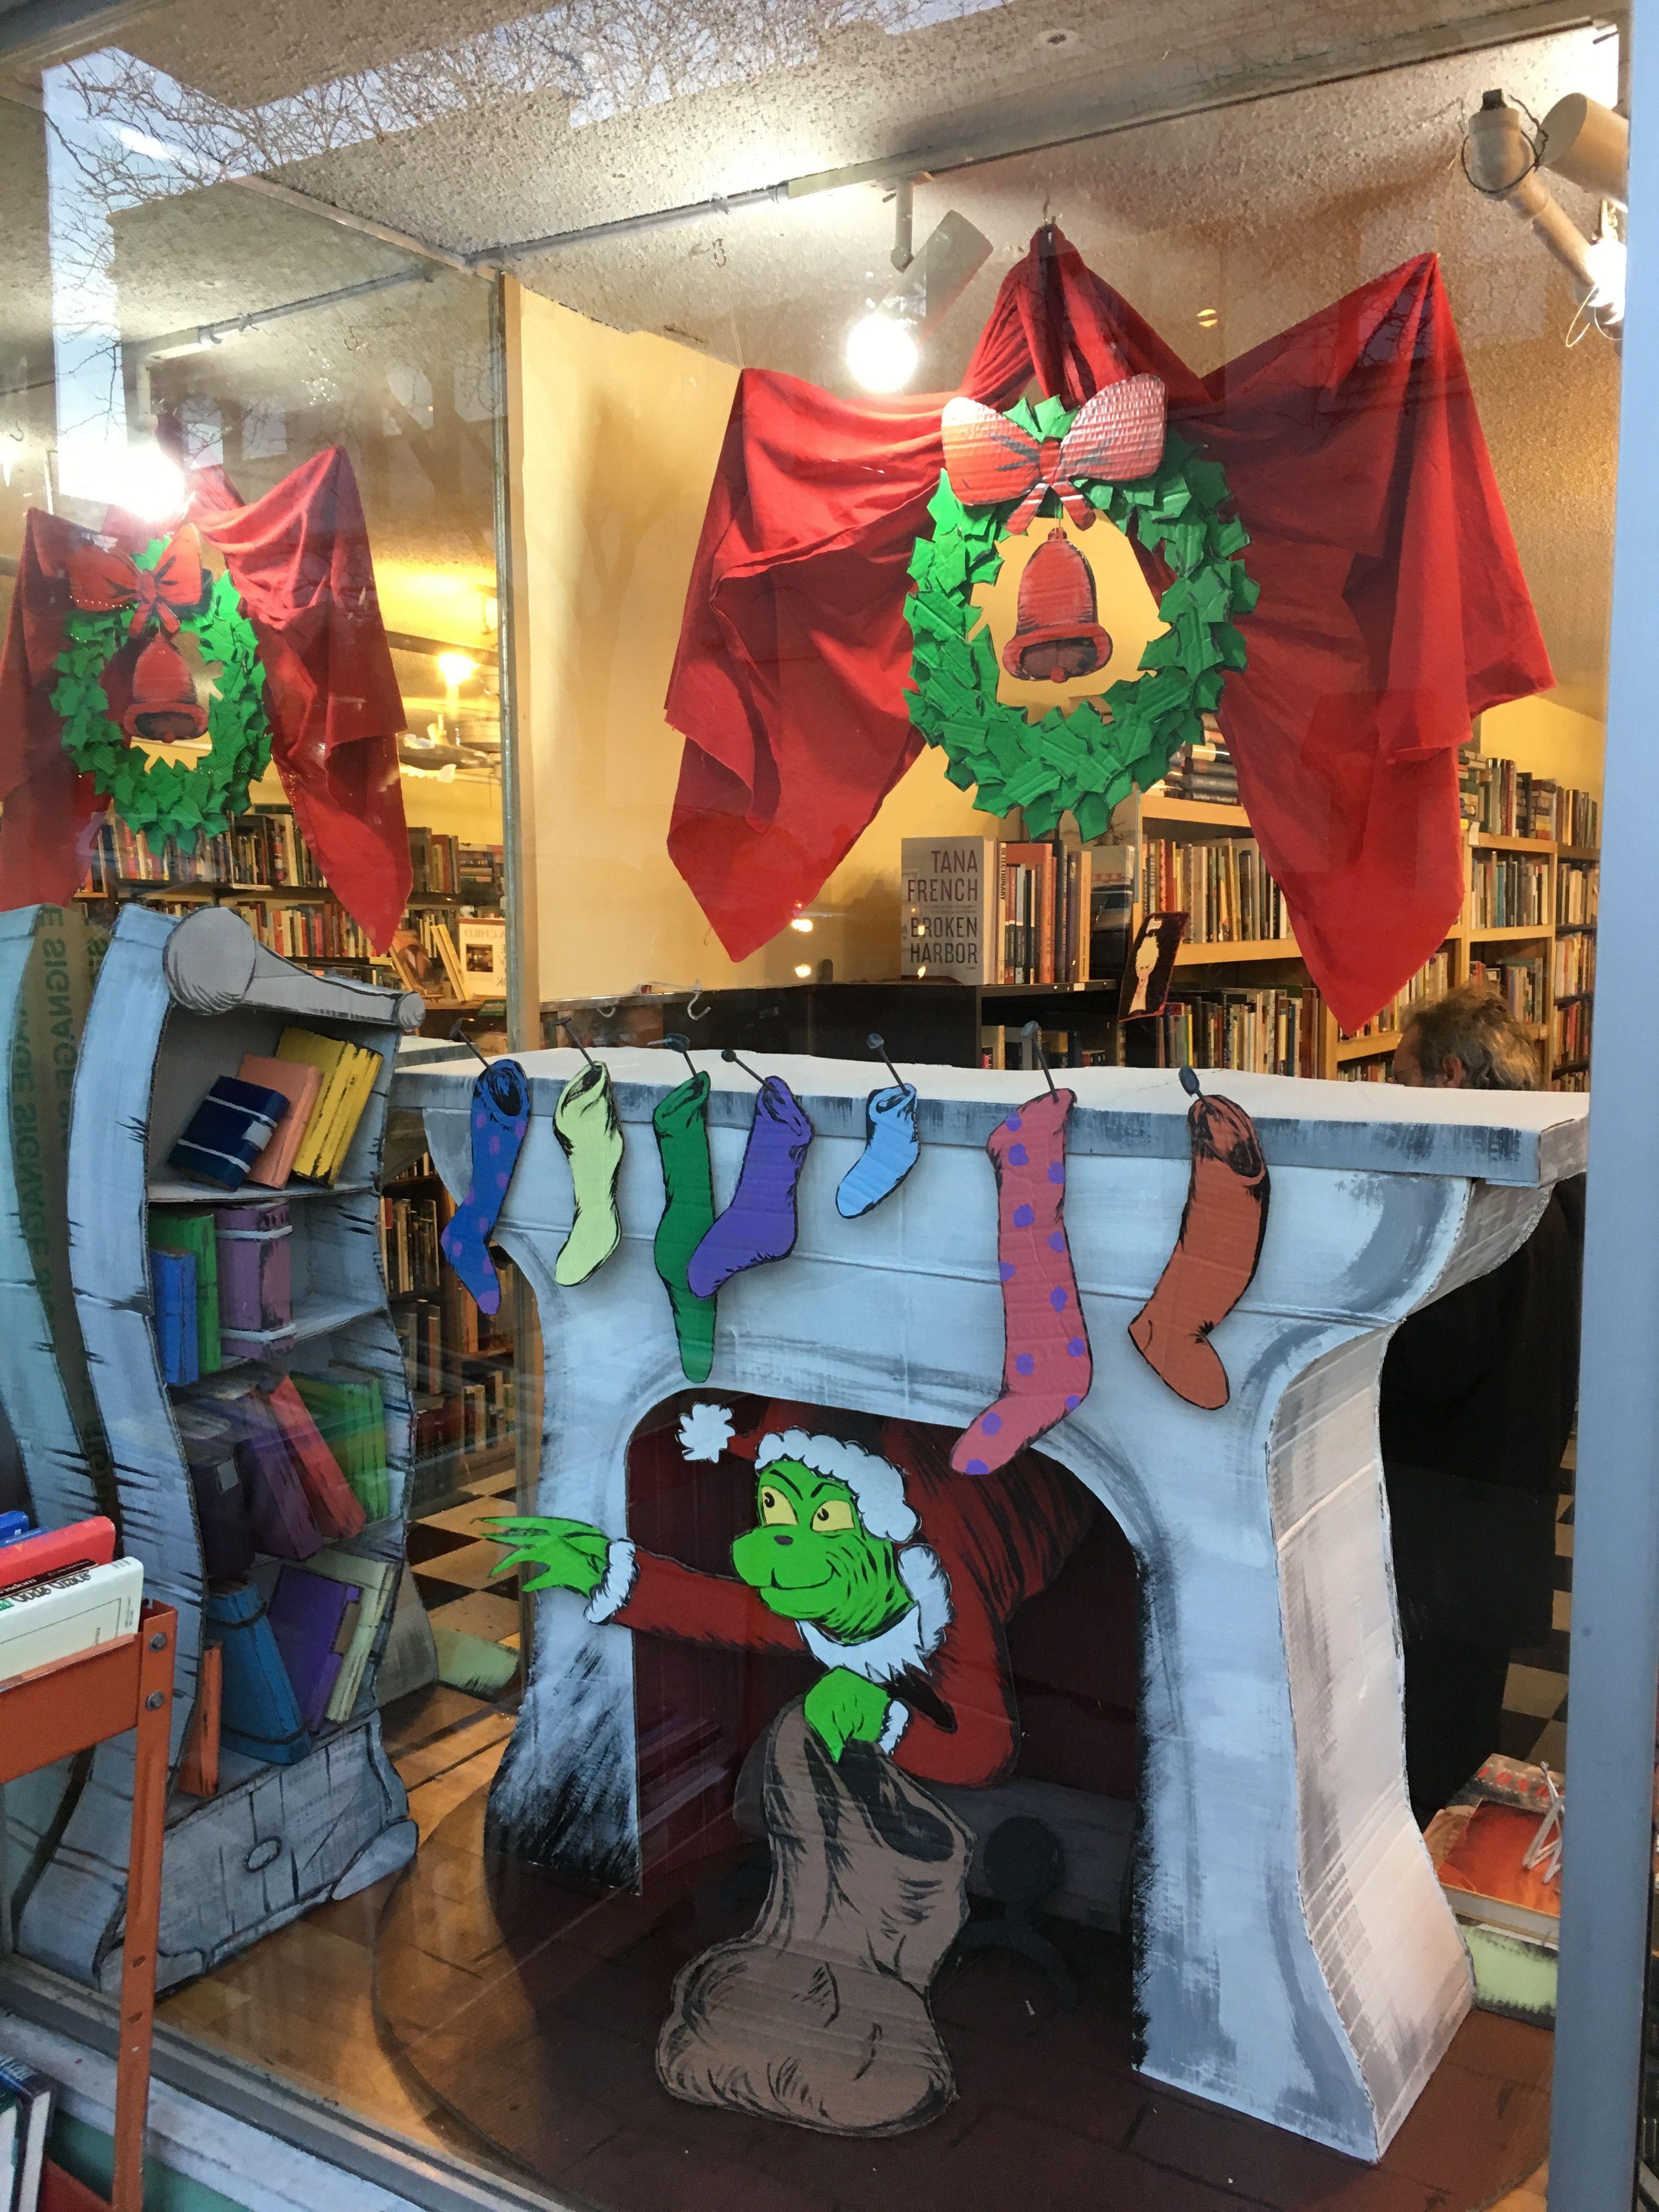 Grinch Y Window Display Christmas Cubicle Decorations Whoville Christmas Office Christmas Decorations